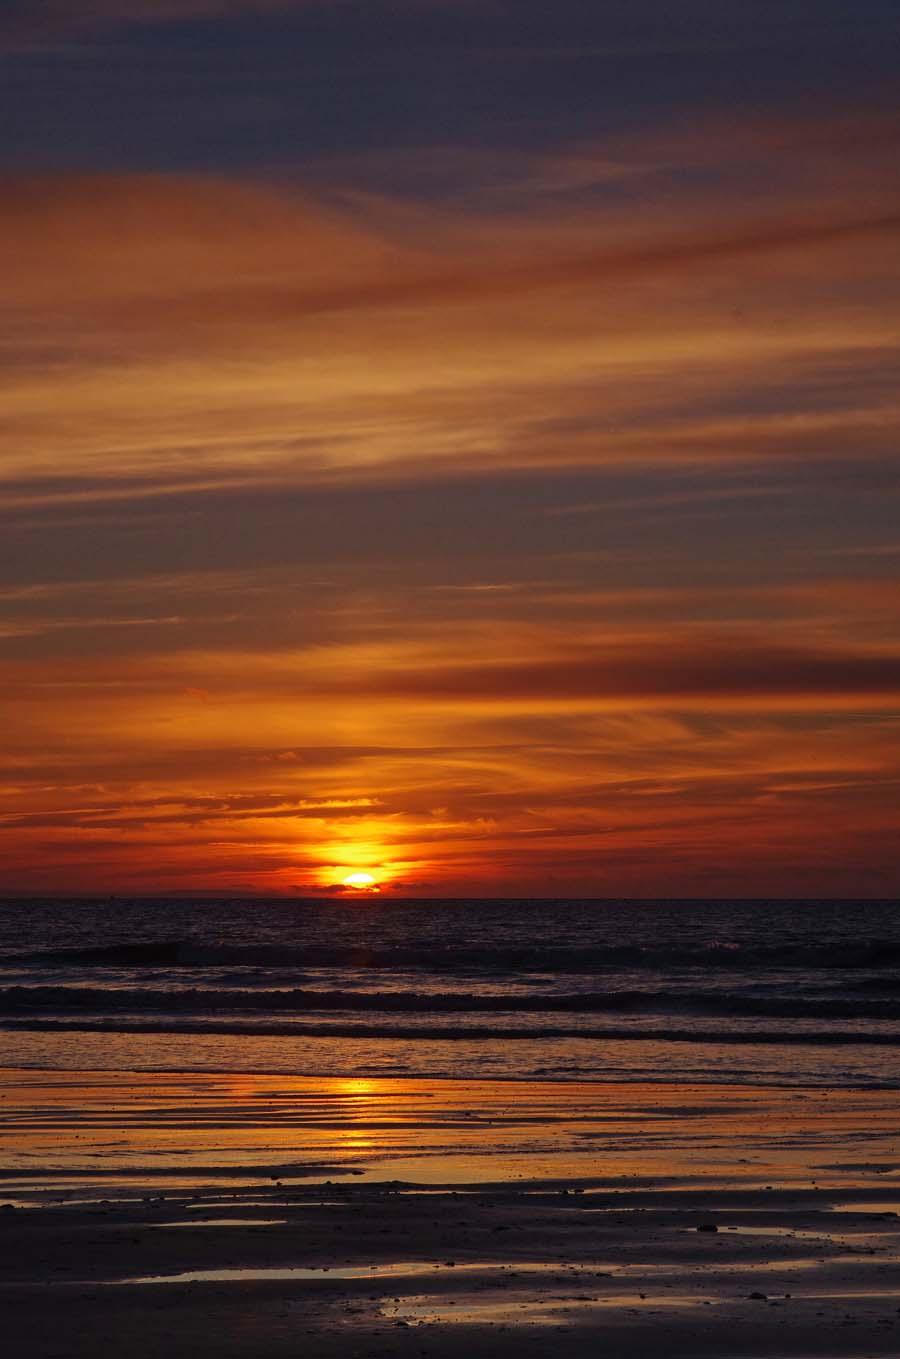 Sunset at Ogmore beach